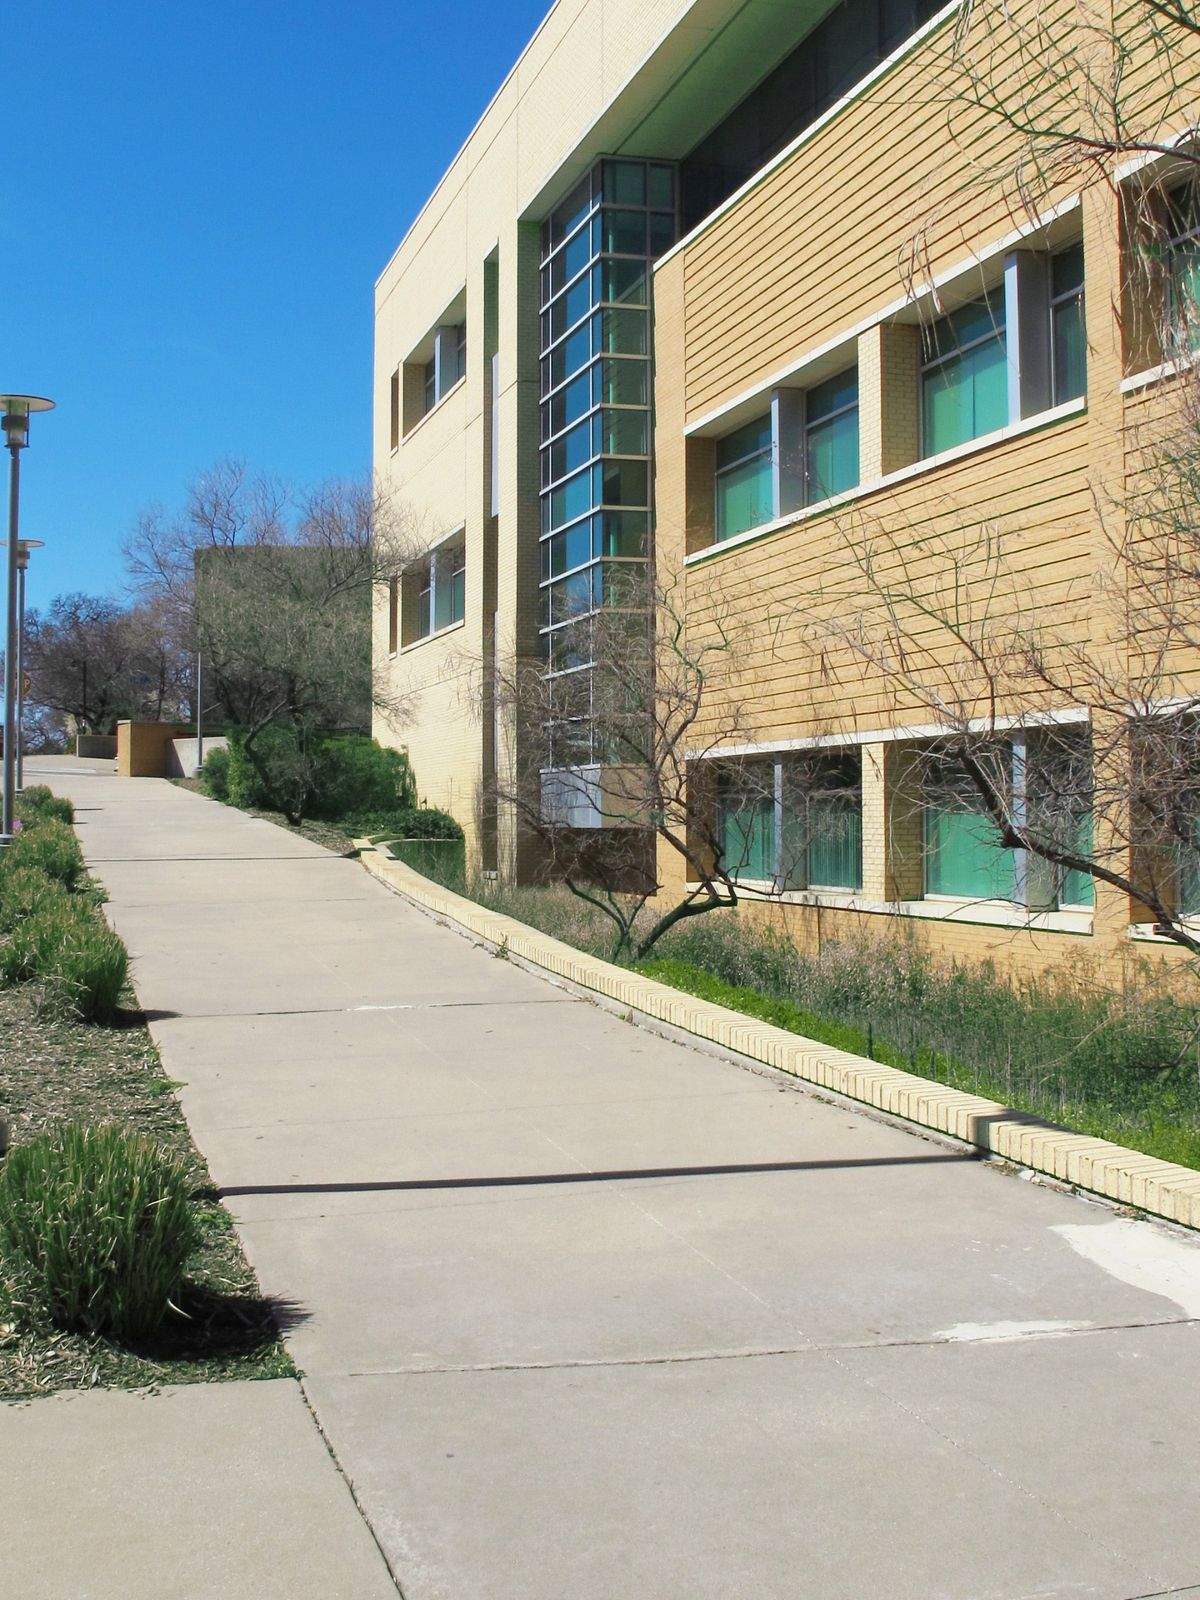 University of North Texas Schools Photo Video Shoot Location39.jpg